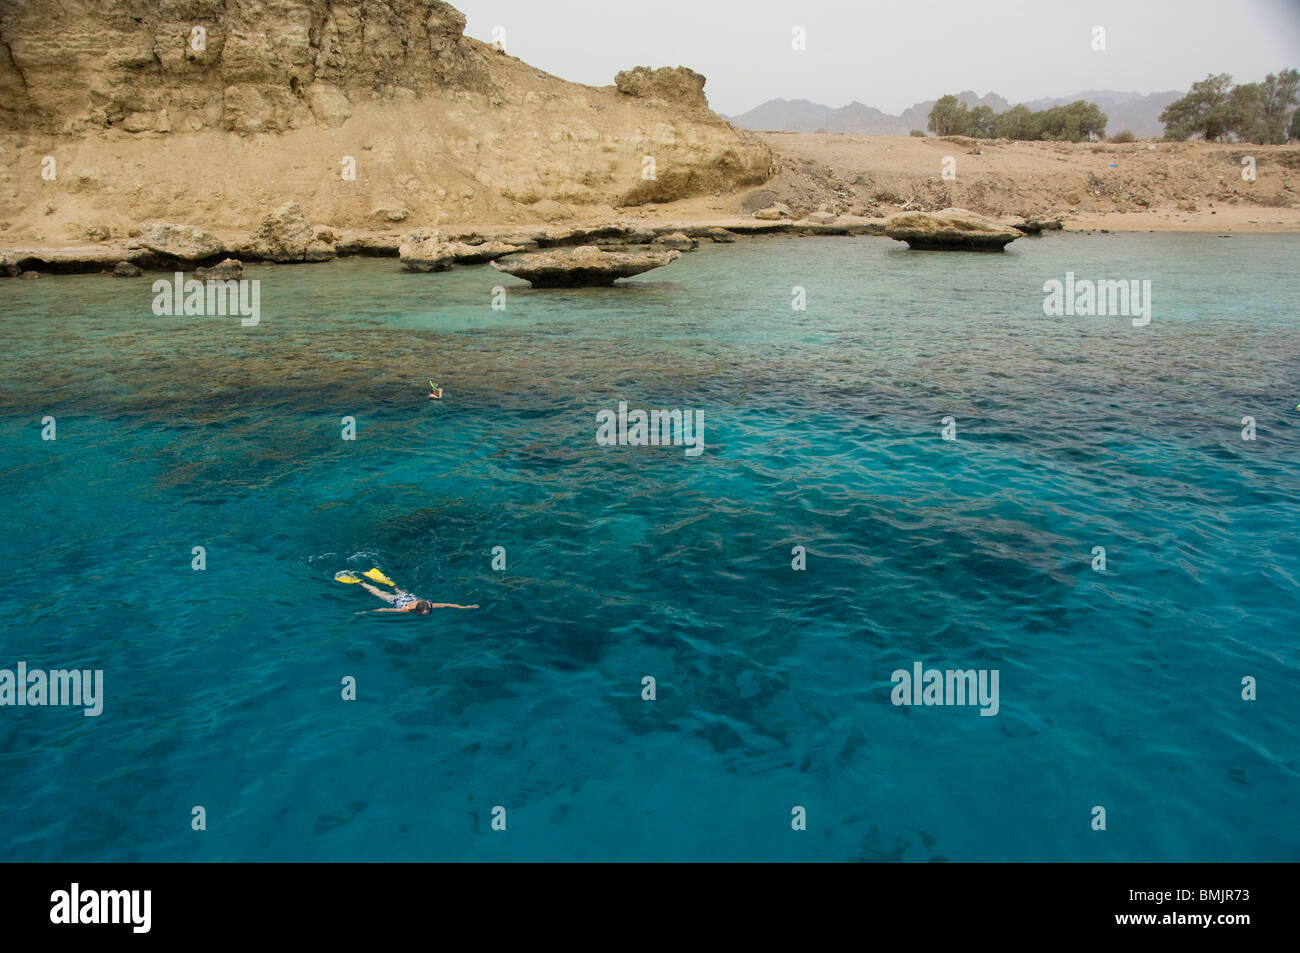 Egypt, Sinai Peninsula, Gulf of Tiran, Sharm El-Sheikh . Snorkeling in the Red Sea's Ras Mohammed National Marine - Stock Image